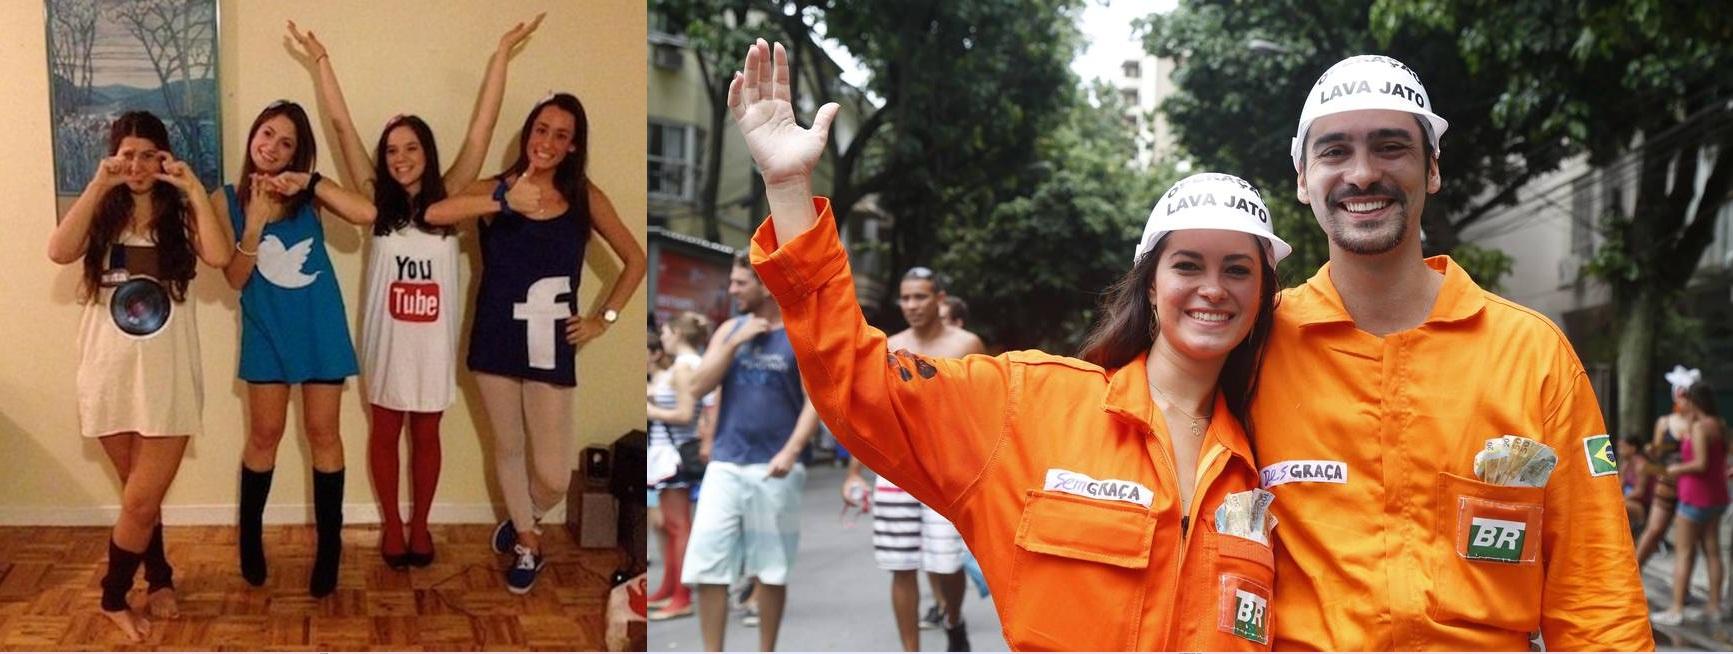 ironicas-achadochique Moda de rua: 5 Looks de carnaval para montar gastando pouco